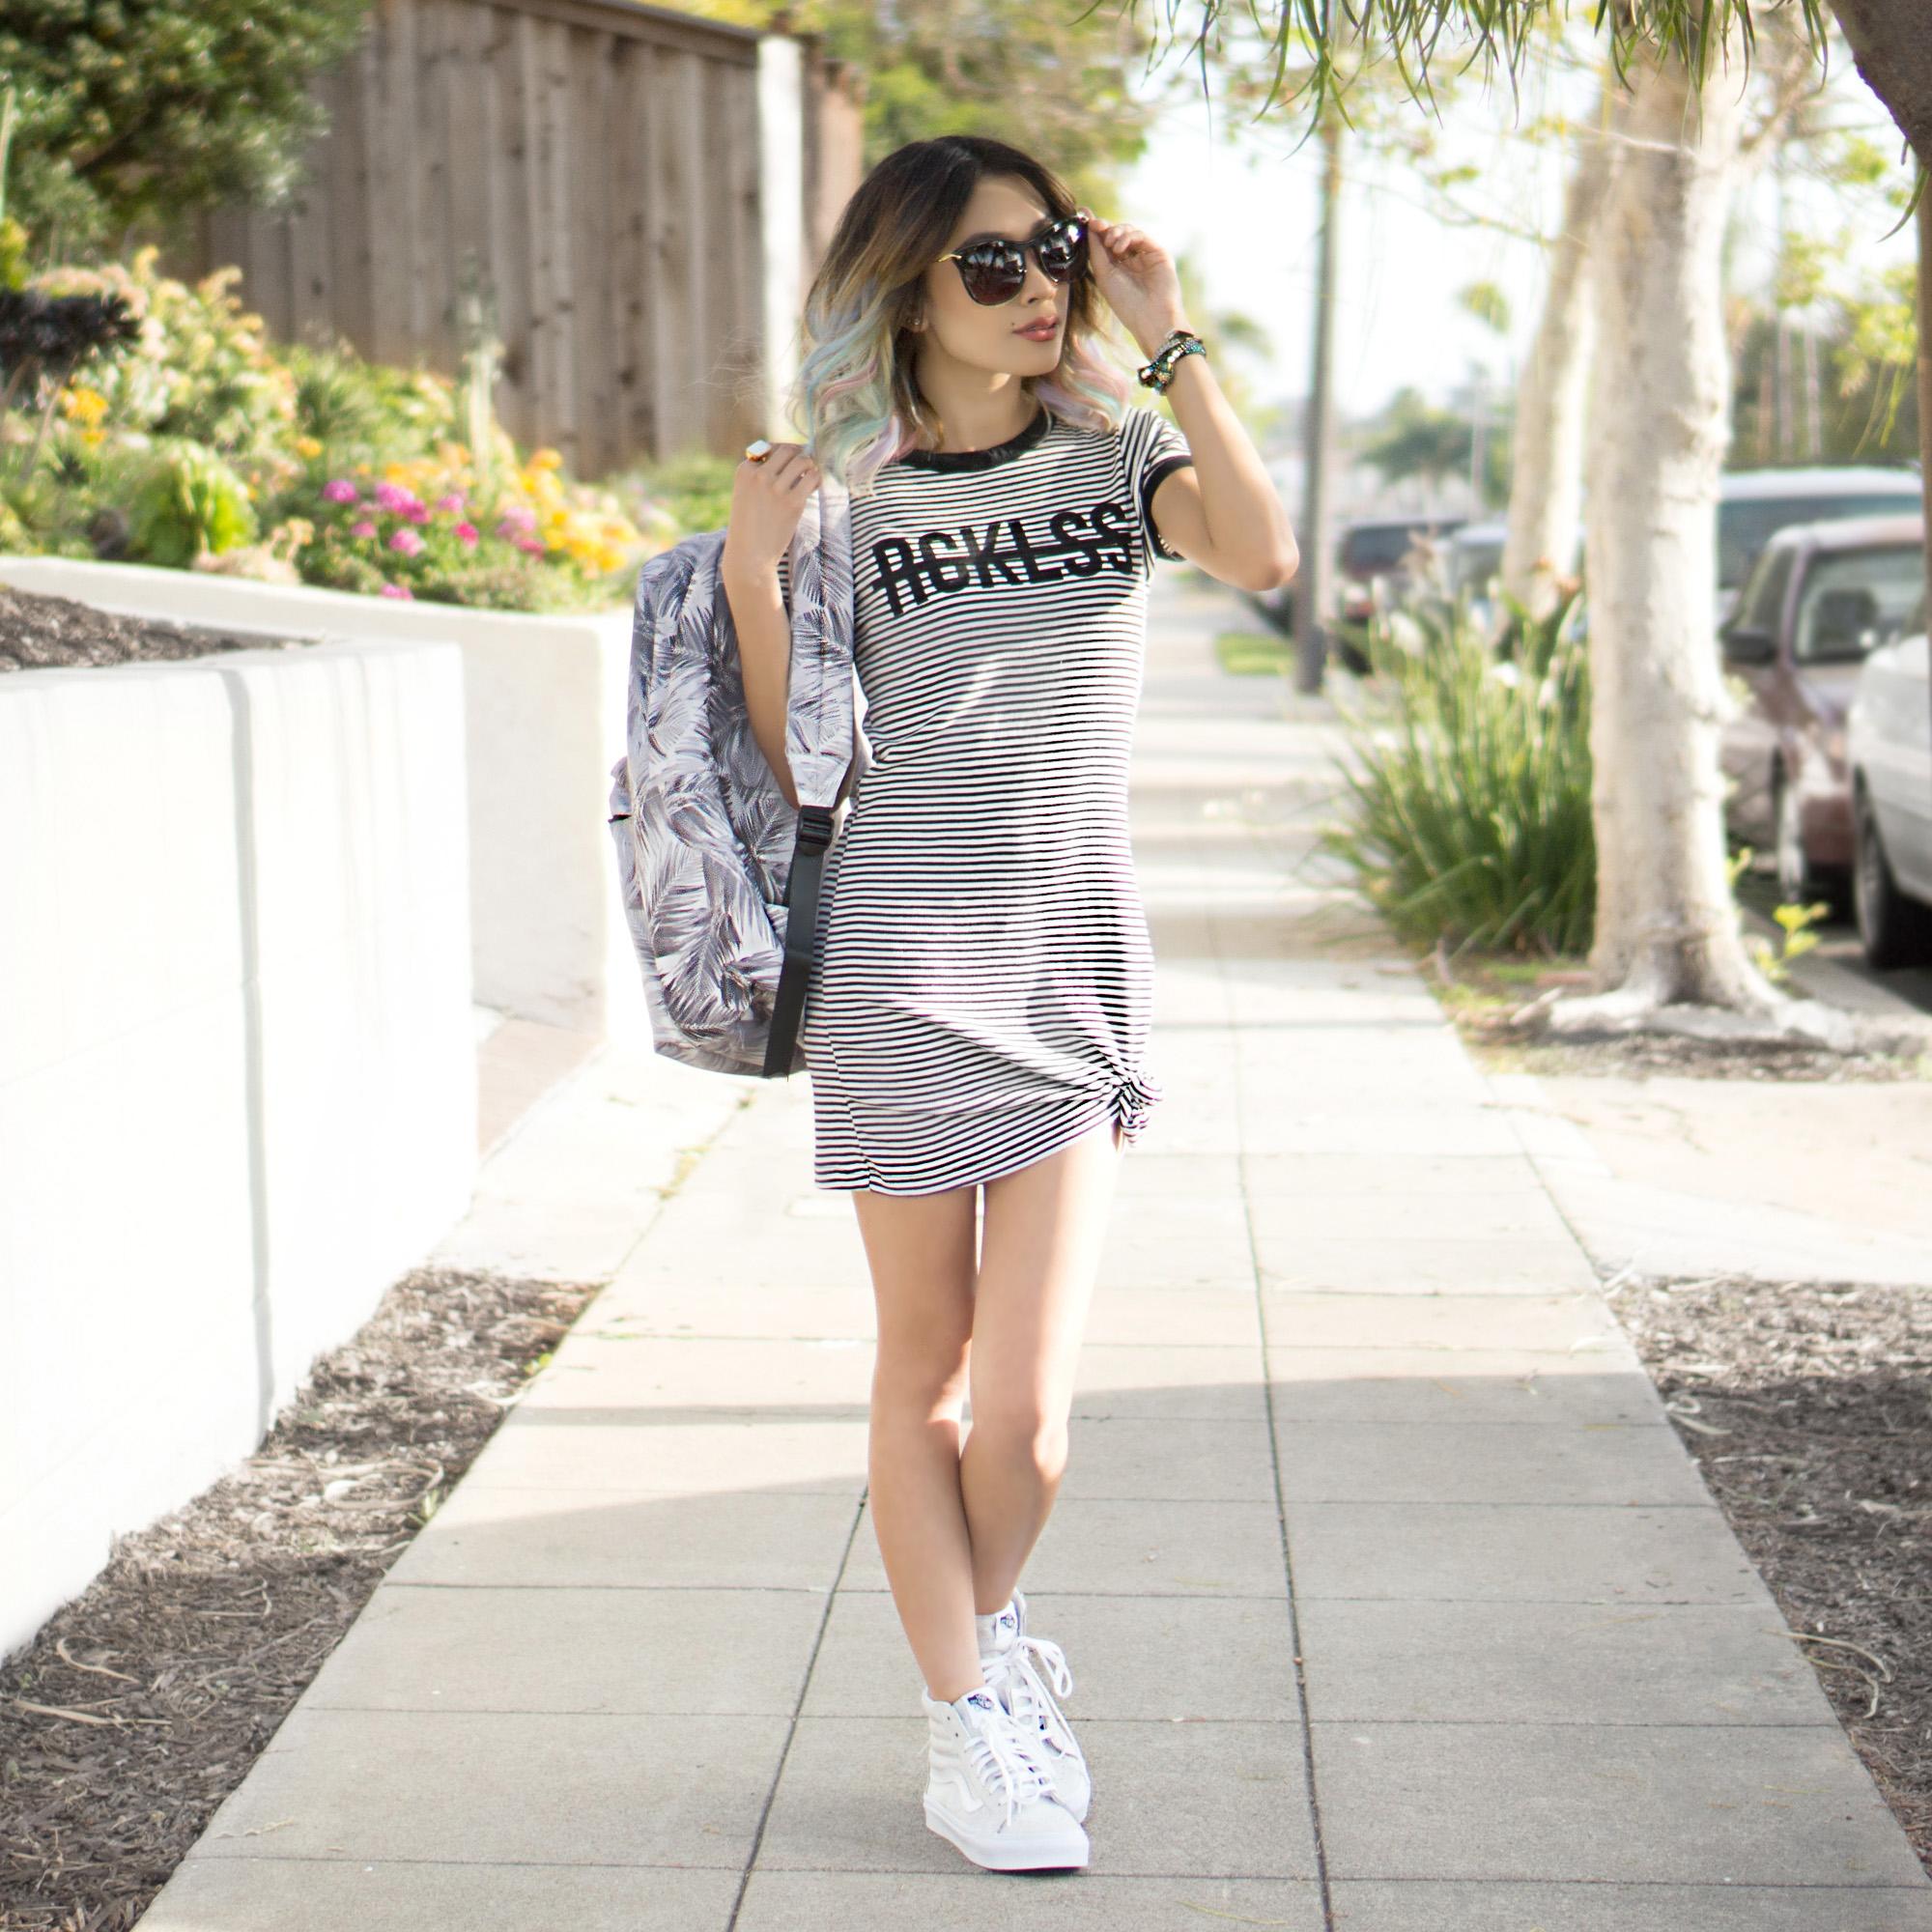 Dress :  Come Thru Dress    Shoes :  Unisex Sk8-Hi Slim Zip (Crackle Suede) Skate Shoe    Backpack :  Birksun    Sunglasses :  Fairfax